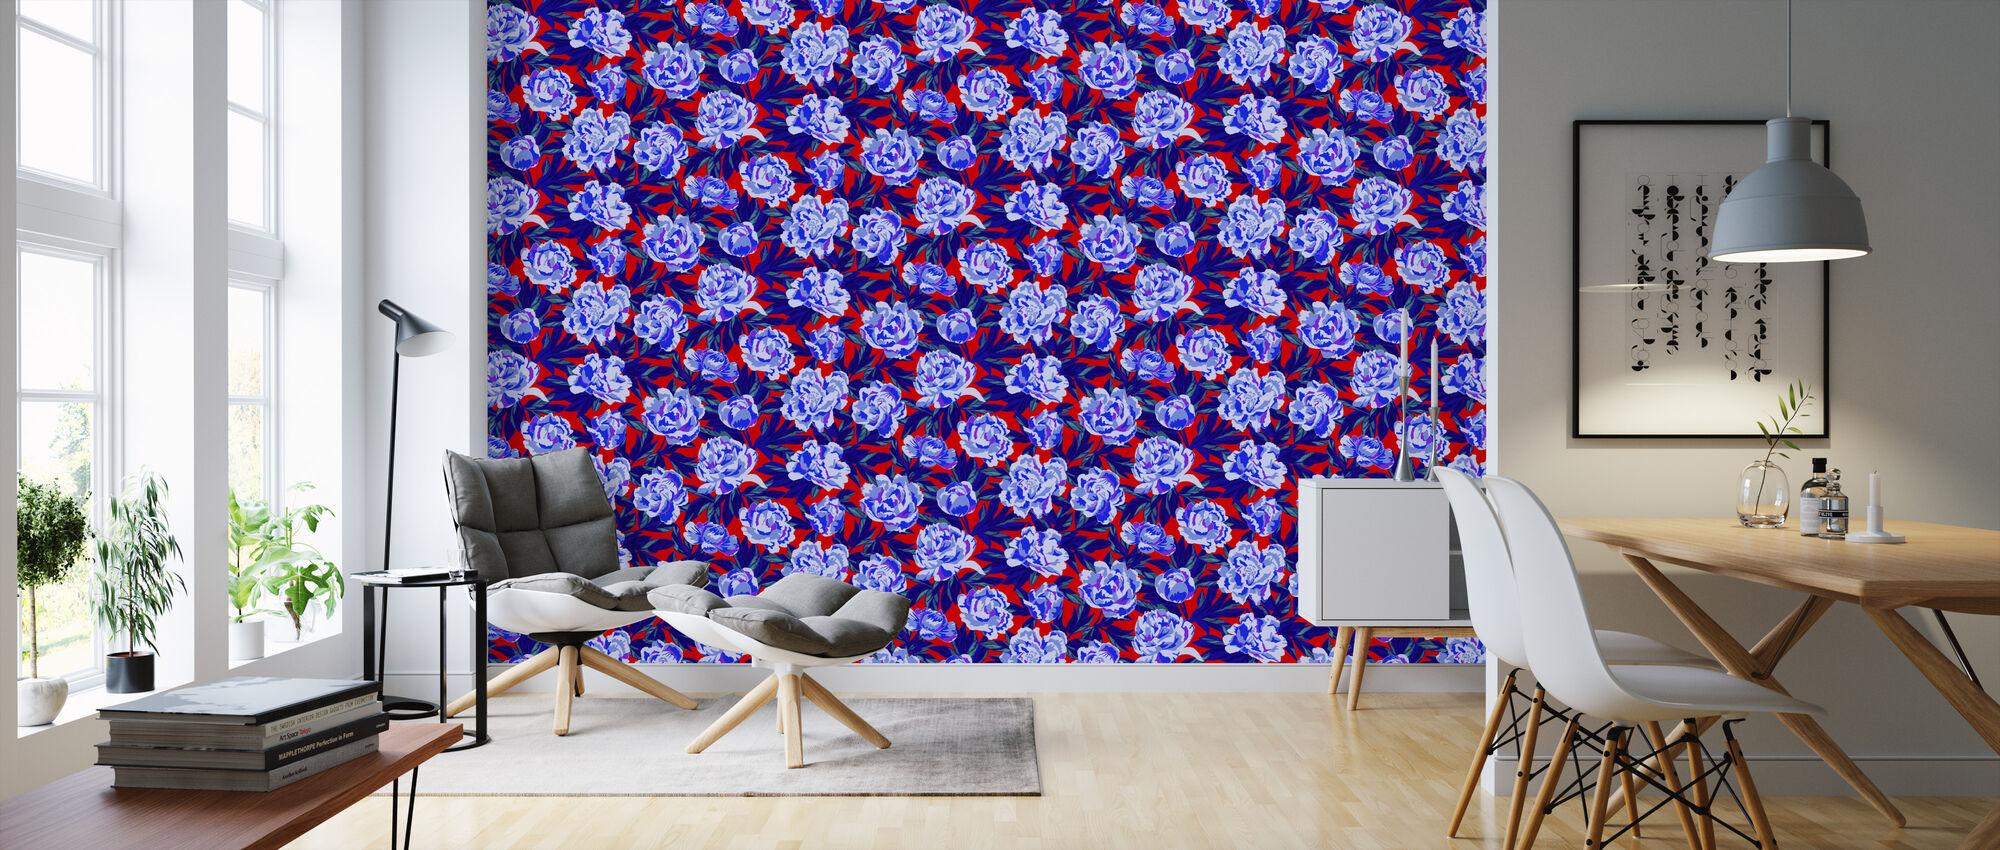 Blaze Red - Wallpaper - Living Room